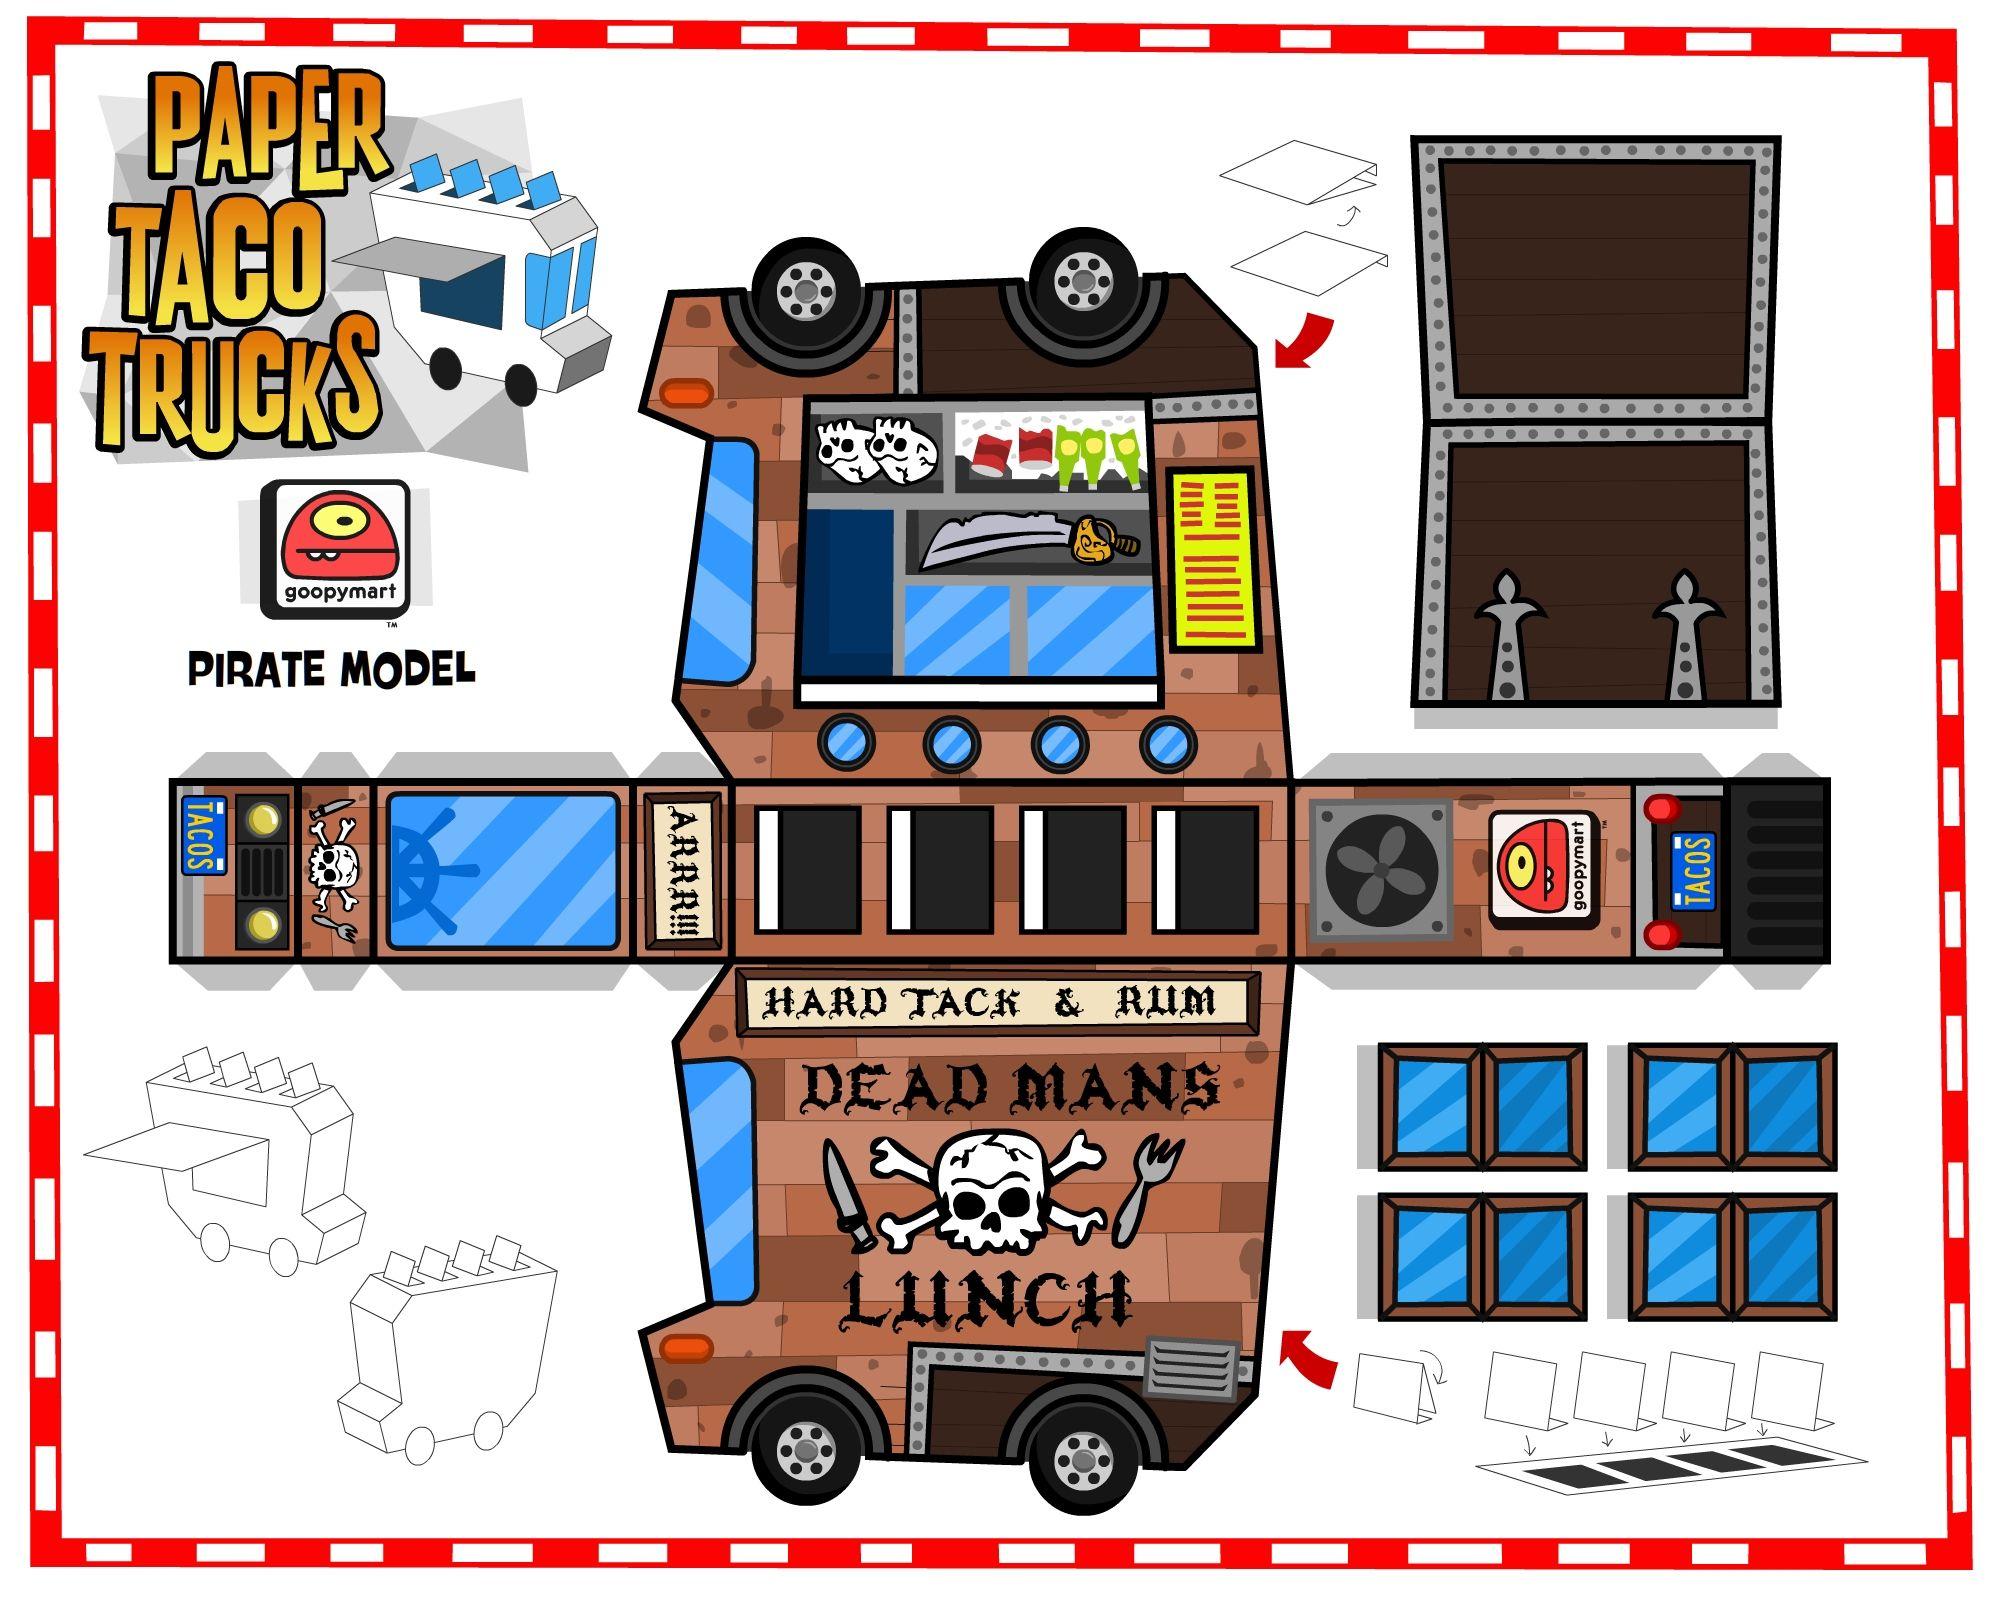 Paper Taco Trucks.